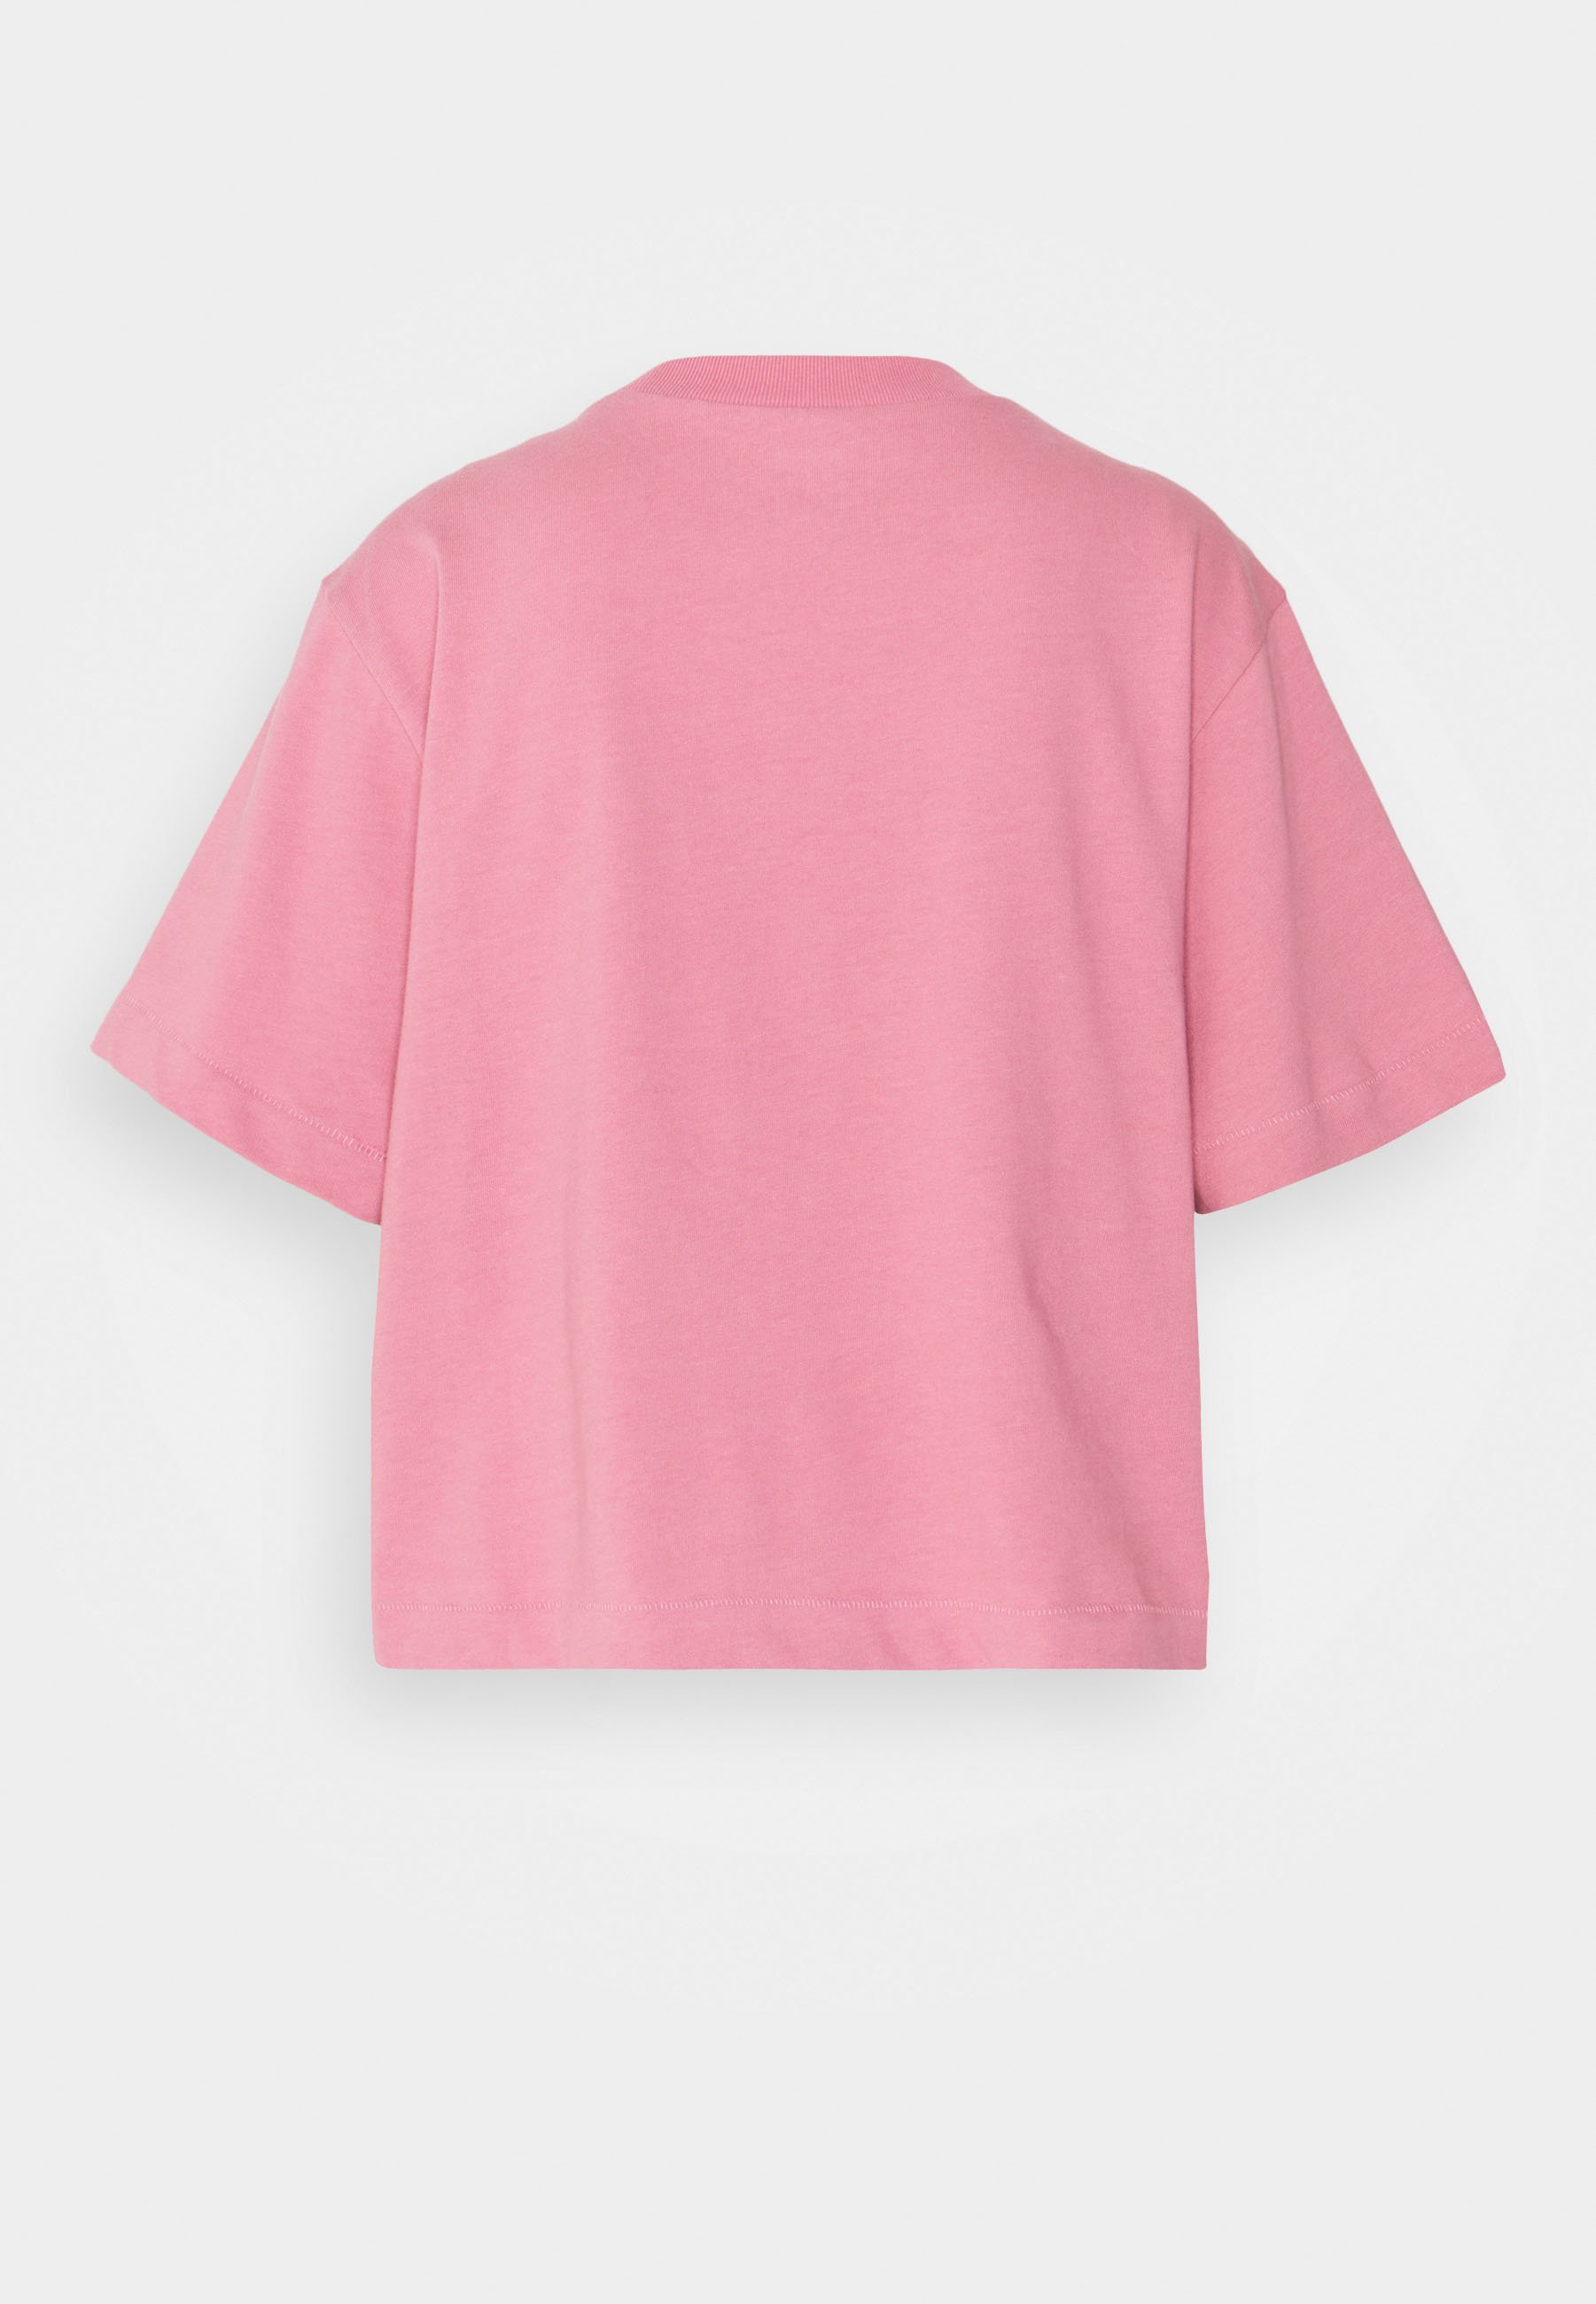 Gap Boxy Crop Tee - T-shirts Med Print Rosetta/lyserosa